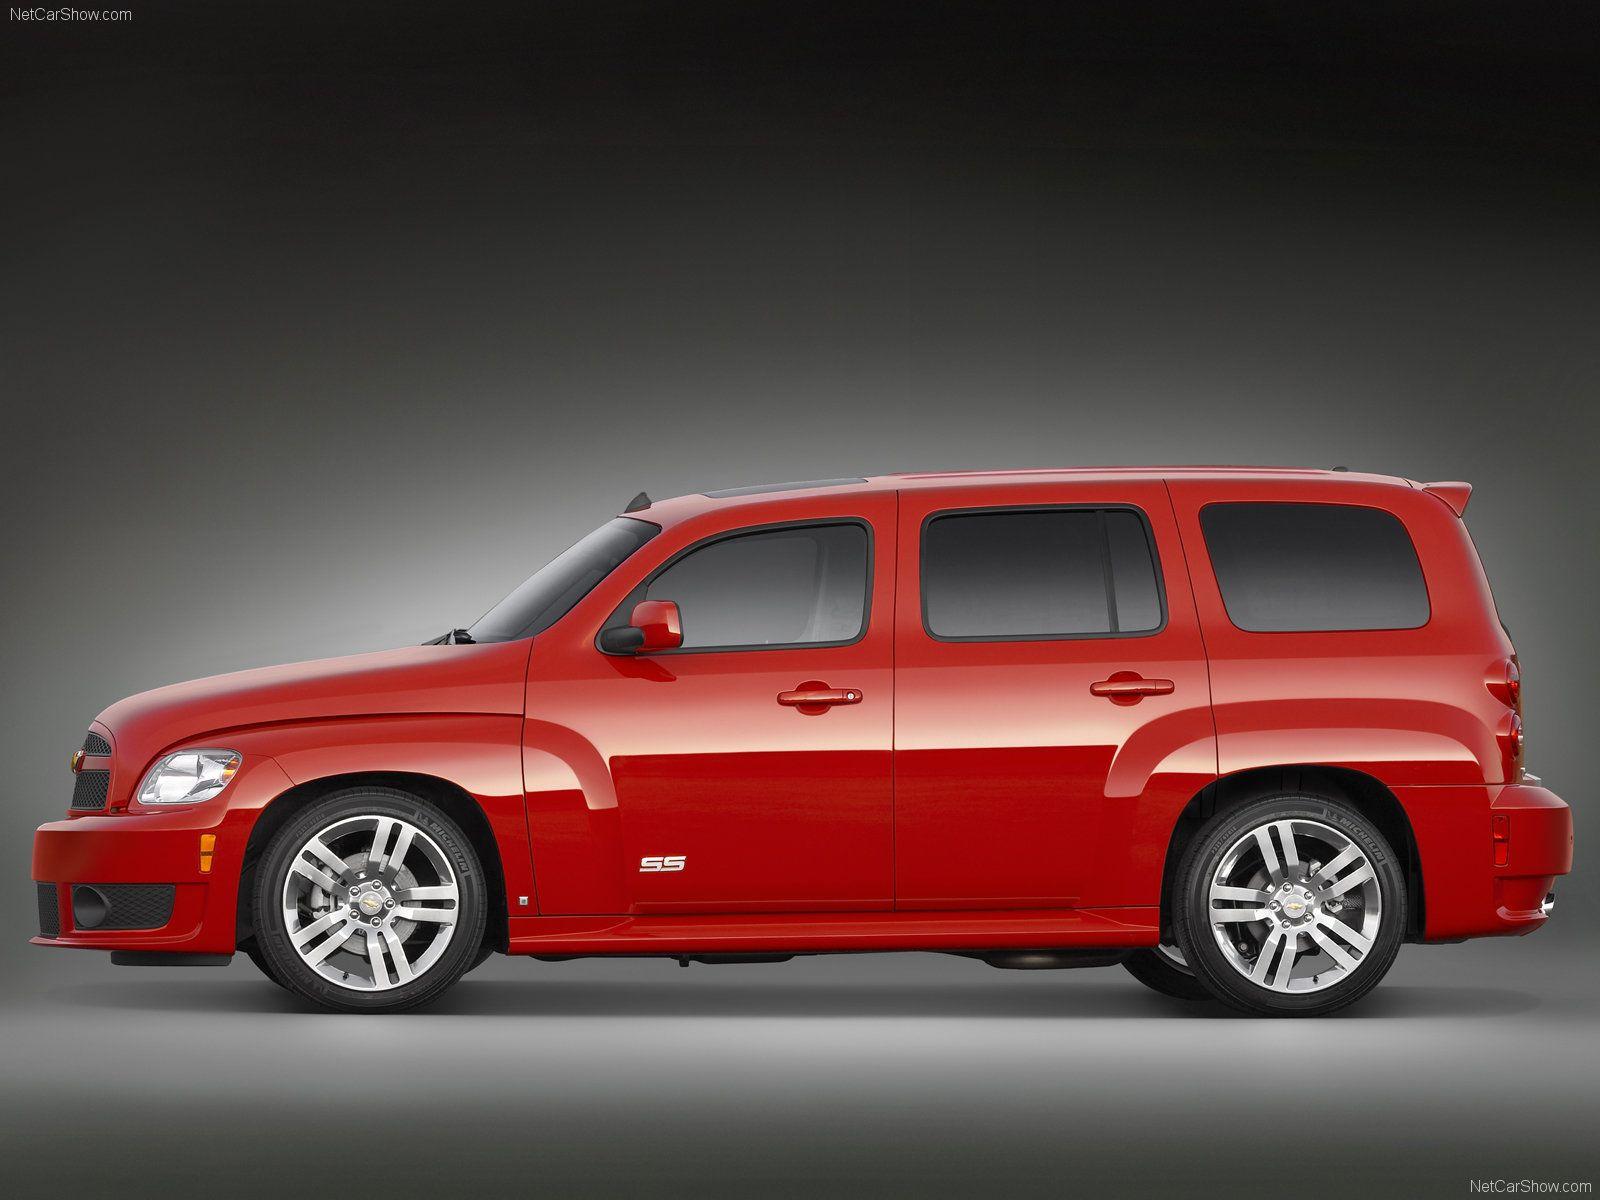 Hhr Ss Fuse Box Diy Enthusiasts Wiring Diagrams Diagram Chevrolet Photo Nice Rides Pinterest Chevy Rh Ca 2008